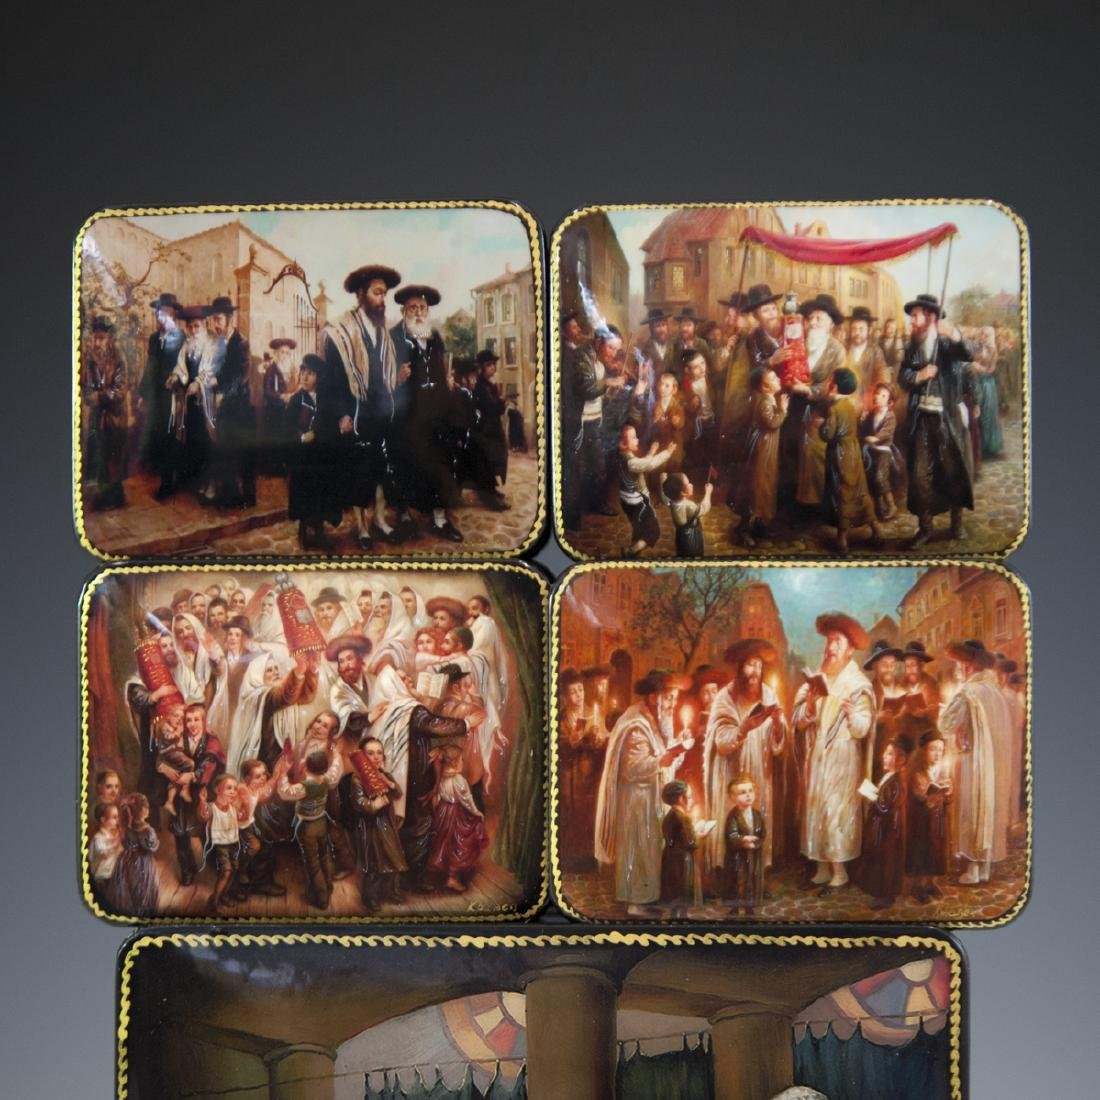 Russian Lacquered Papier Mache Judaic Boxes - 2